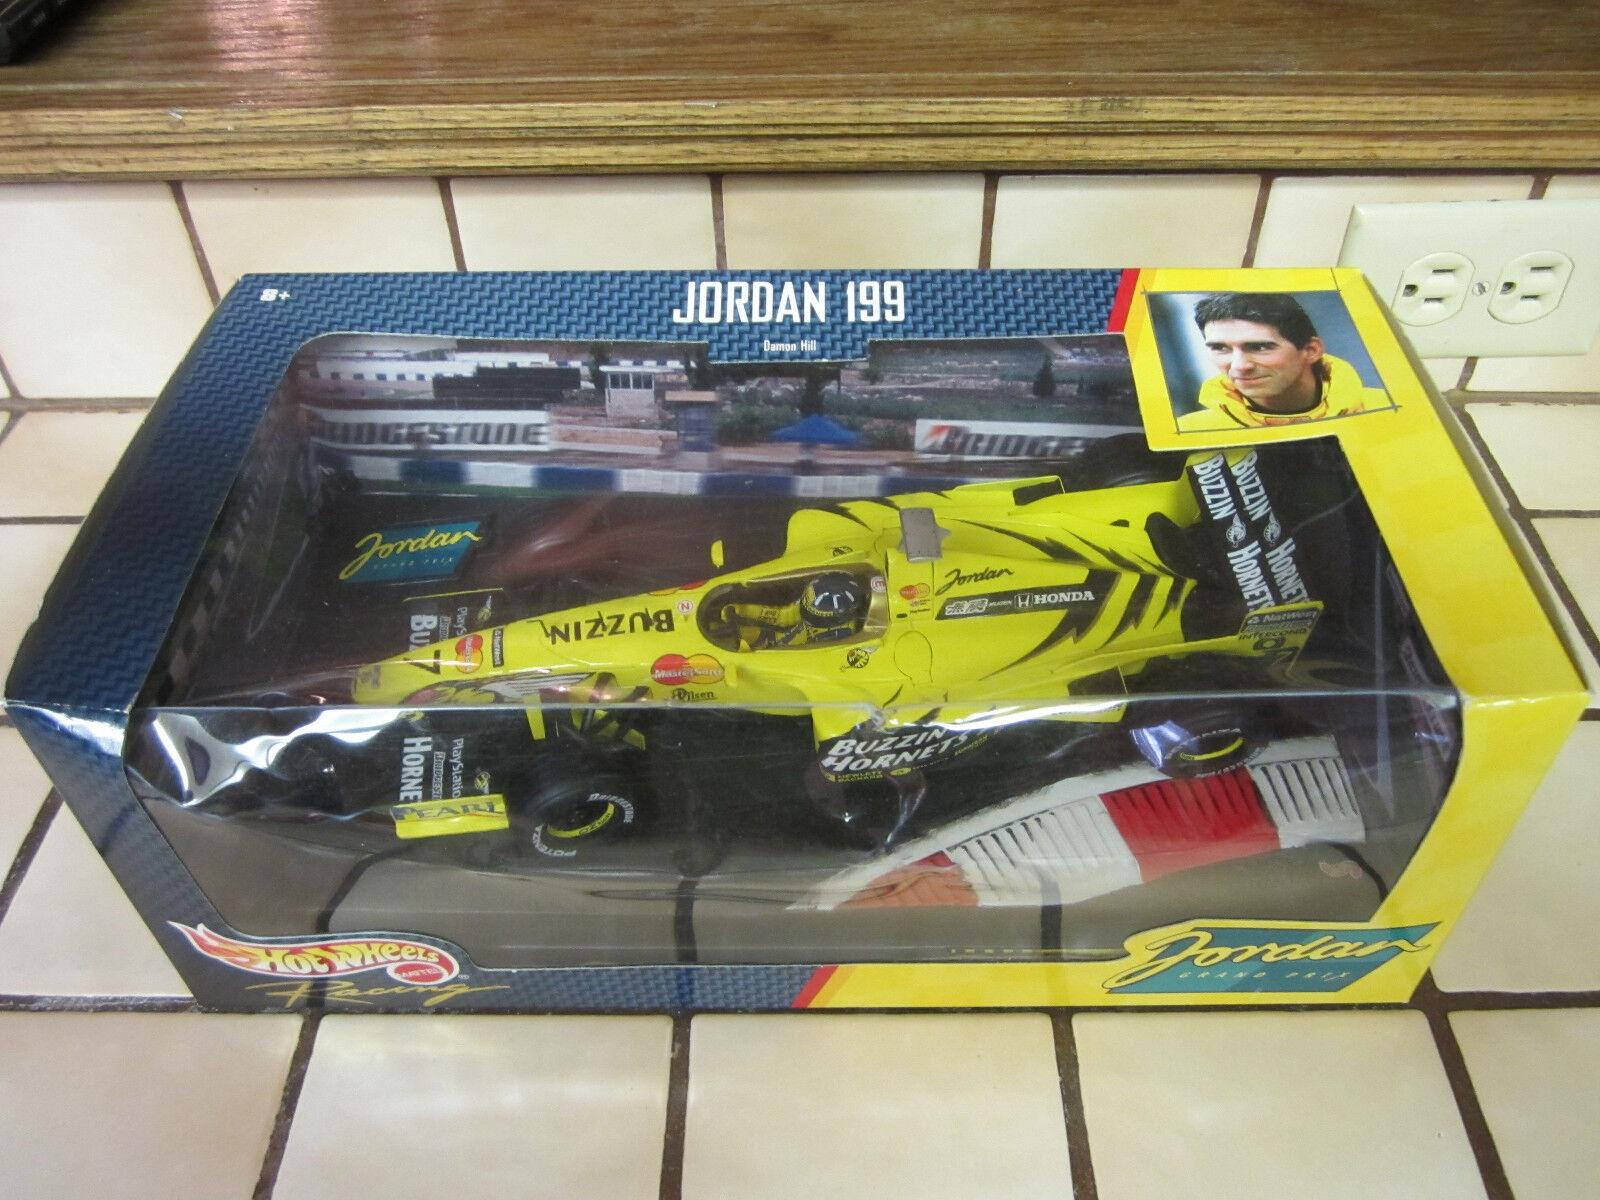 1 18 Hot Wheels Racing Damon Hill Jordan 199 Grand Prix 1999 Mattel